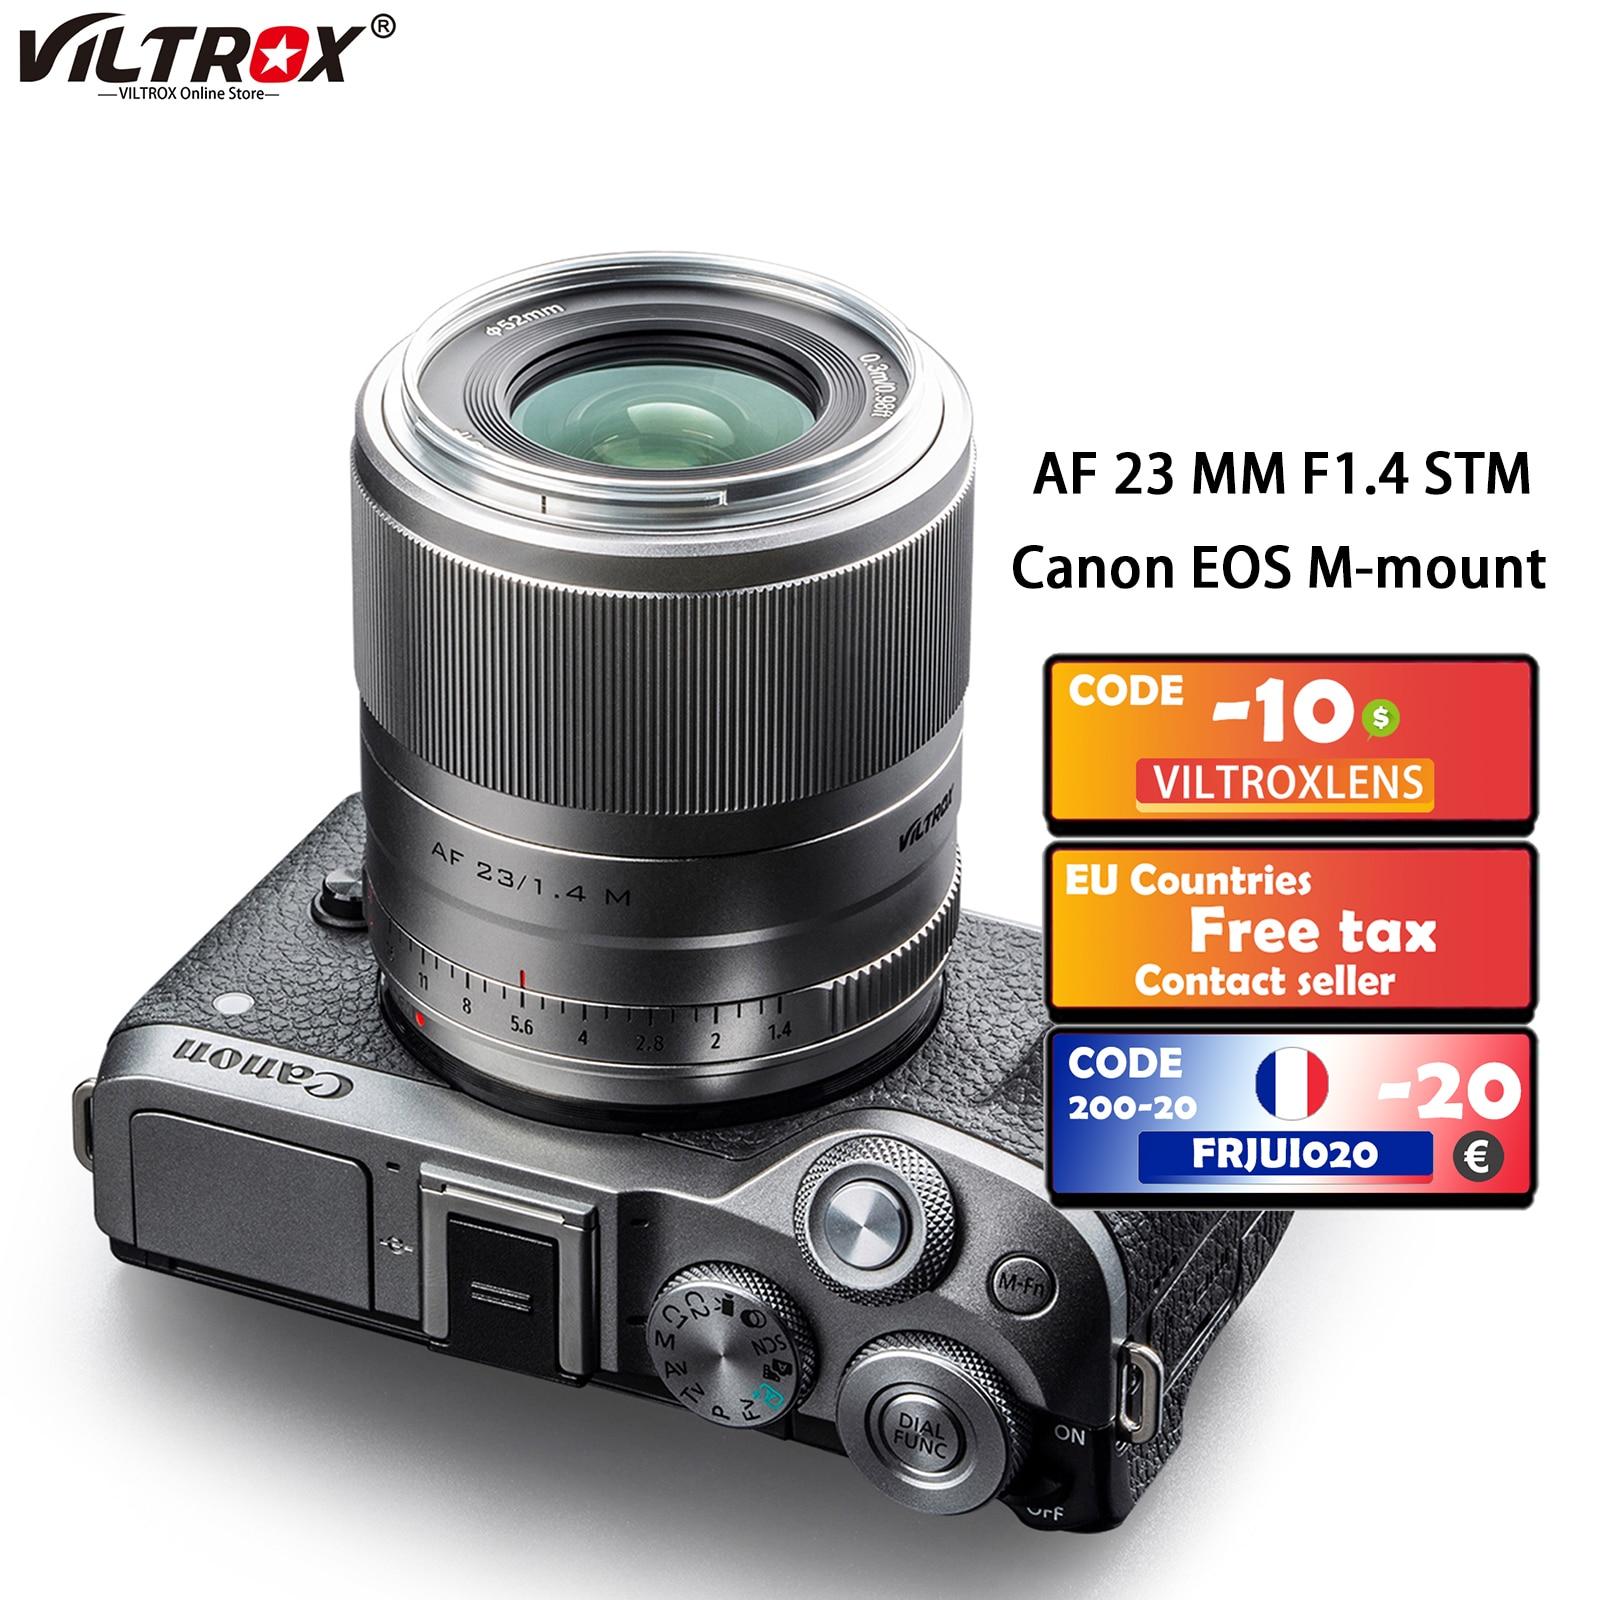 Viltrox 23 مللي متر f1.4 STM Prime عدسة EF-M جبل السيارات التركيز APS-C كاميرا عدسات لكاميرات كانون EOS M كاميرات M3 M5 M6 مارك II M50 M100 M200